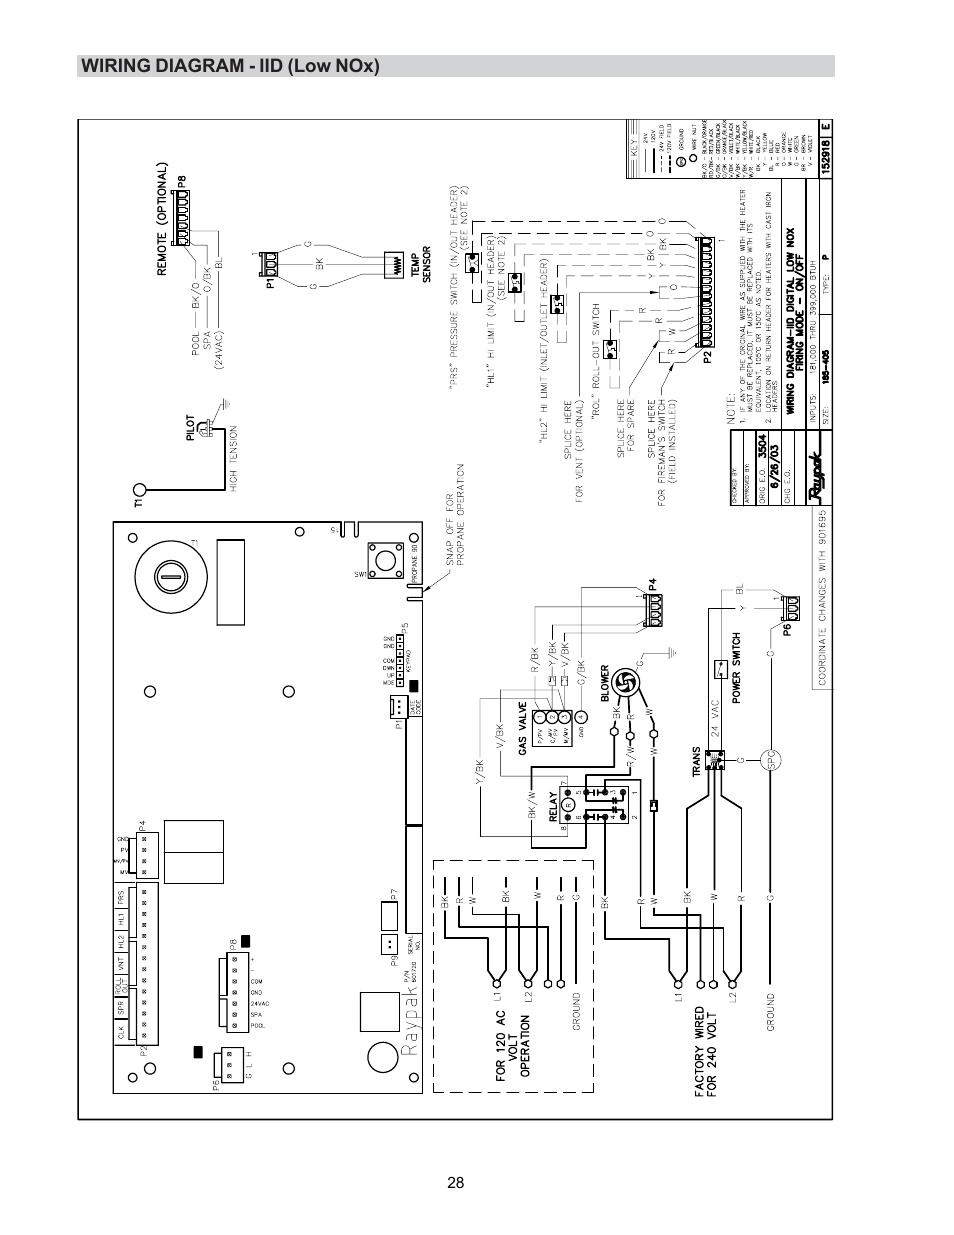 hayward pool heater diagram wiring diagram schematic